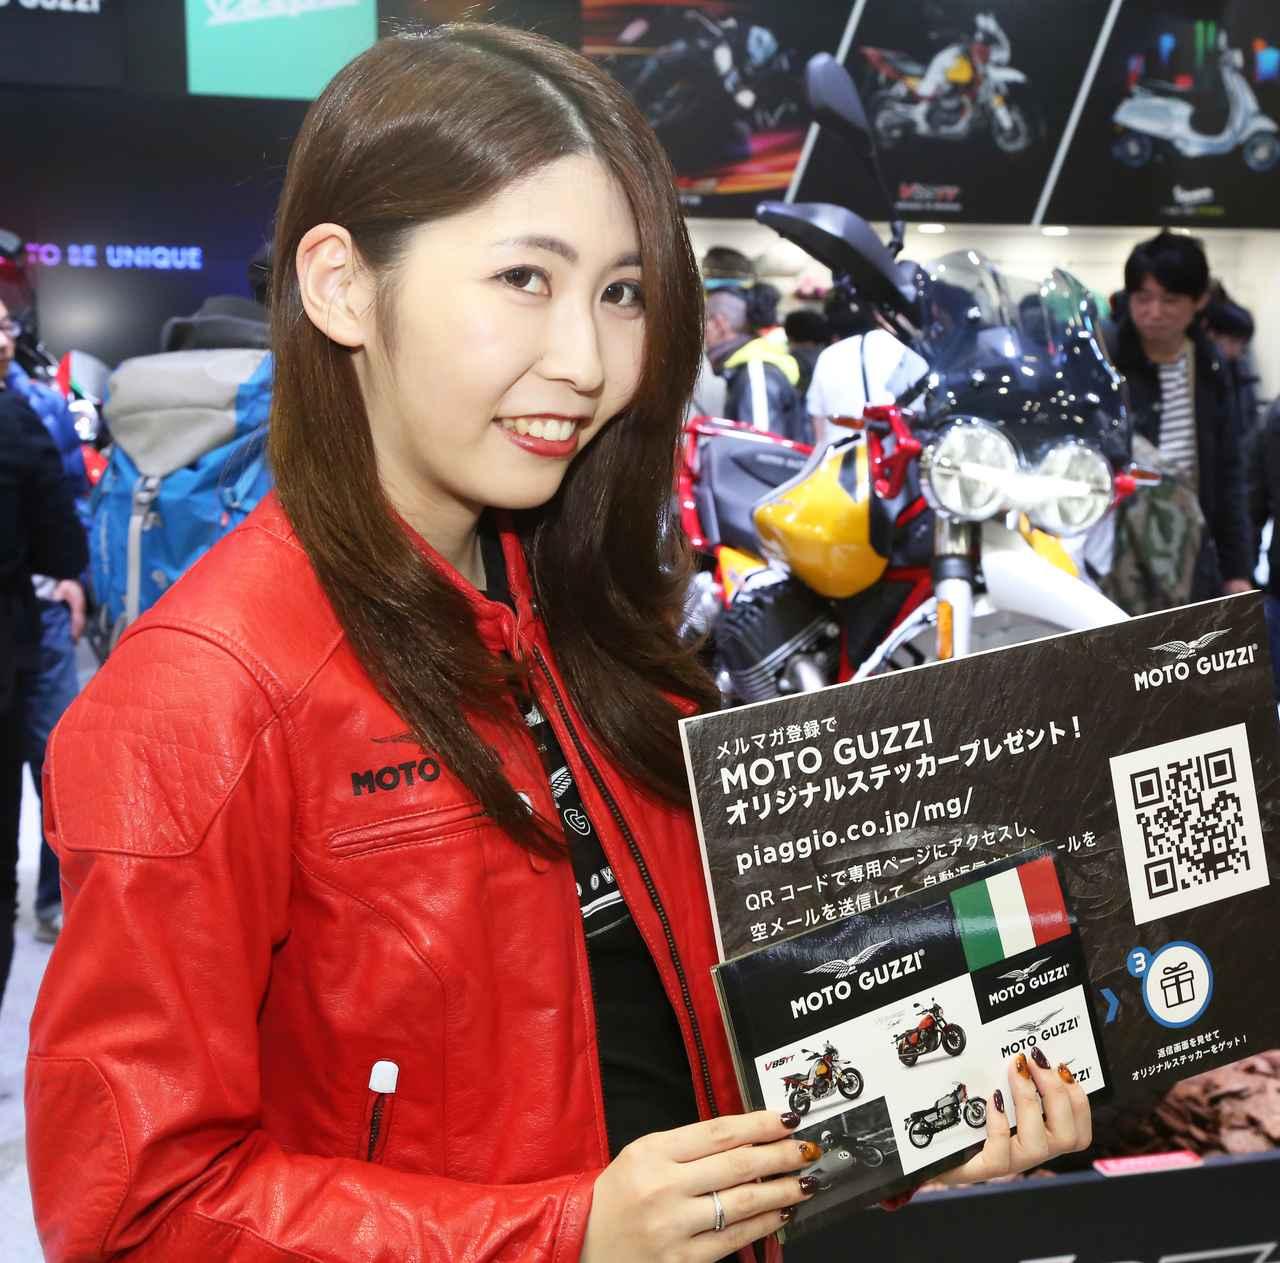 Images : 33番目の画像 - TMCS2019 美女コンパニオン図鑑! - webオートバイ